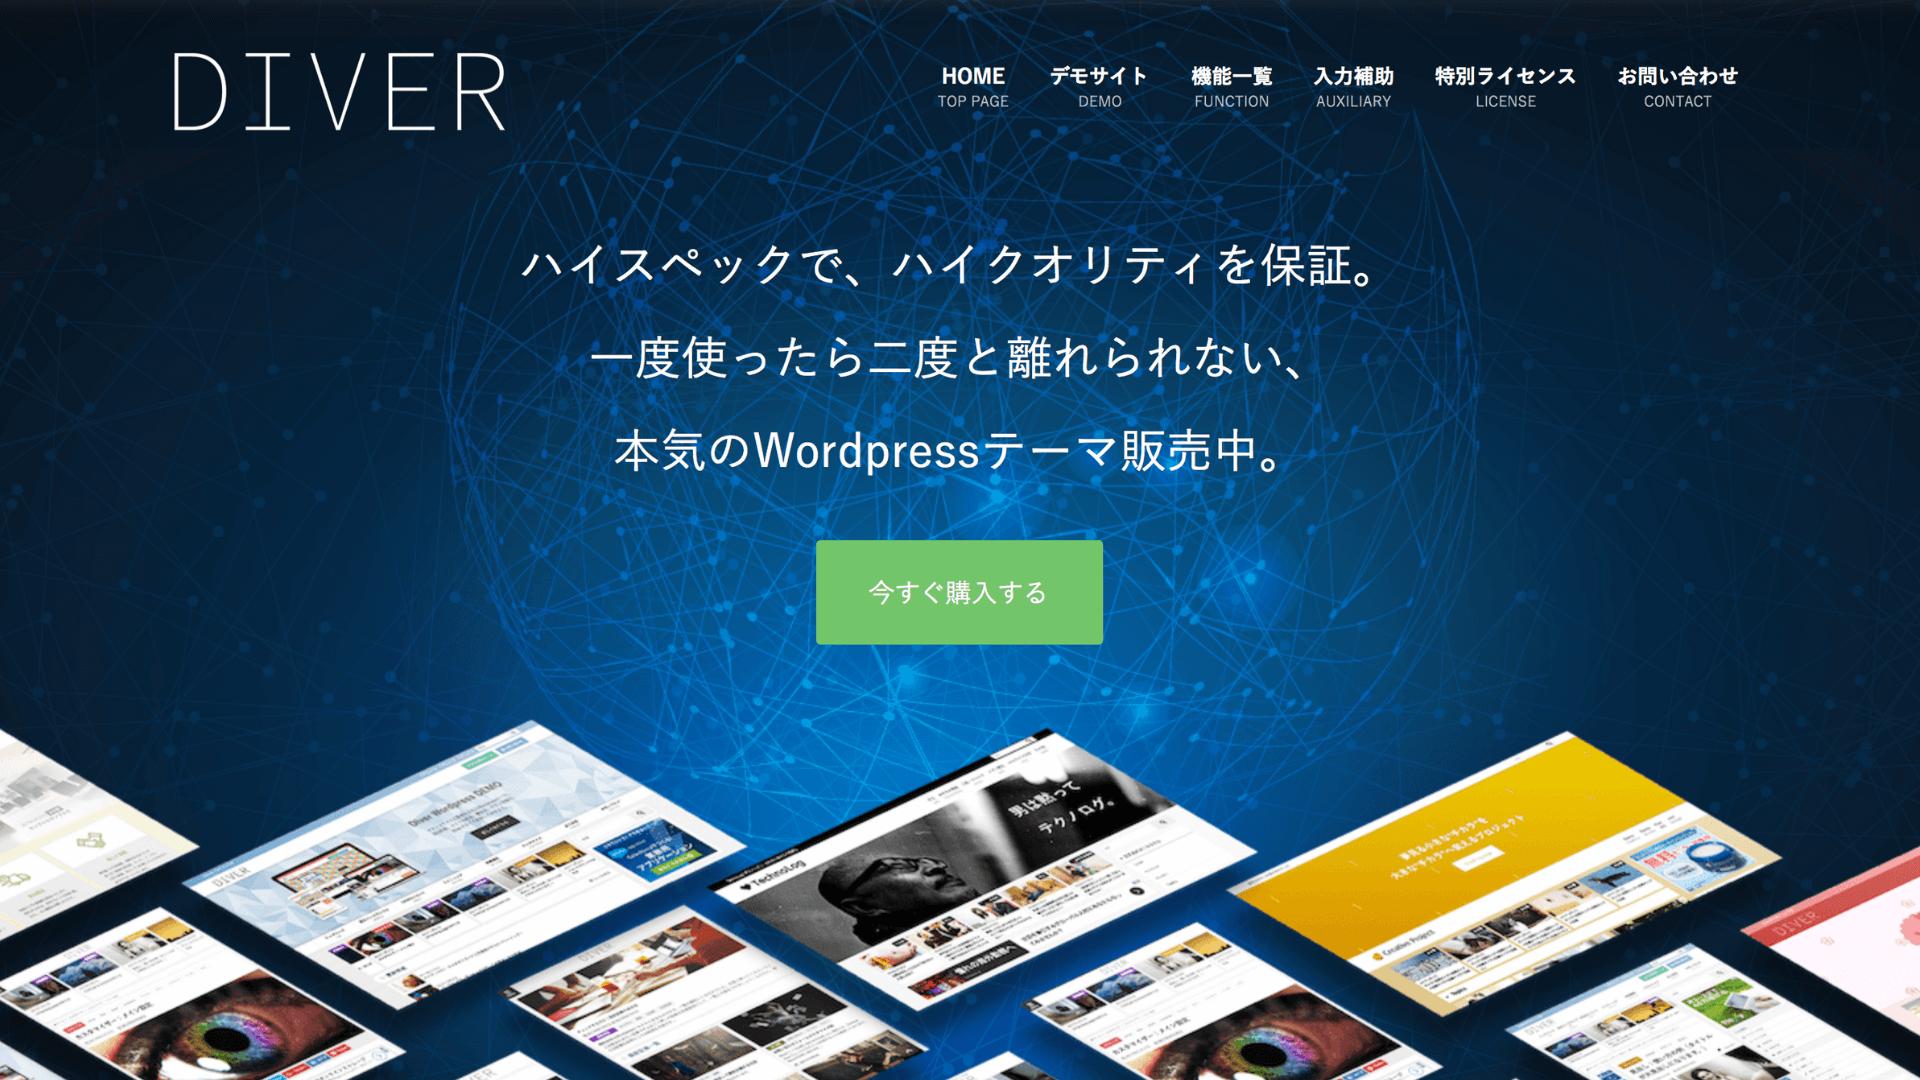 WordPressテーマ『DIVER』の評判・レビューと導入方法を全手順画像付きで解説!